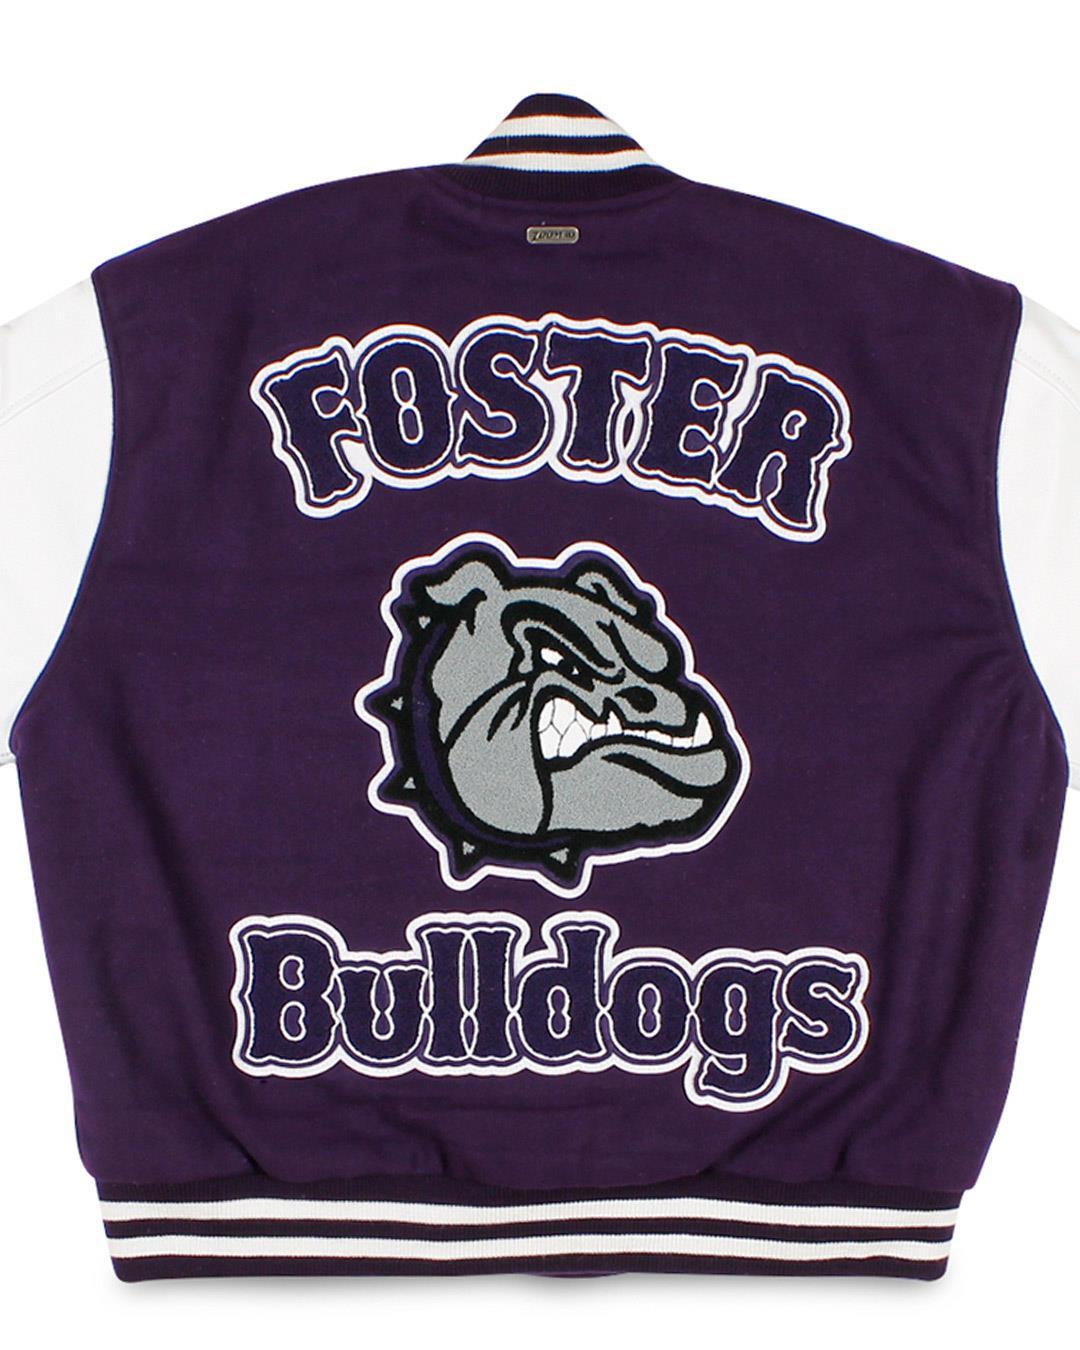 Foster High School Letterman Jacket, Tukwila WA - Back